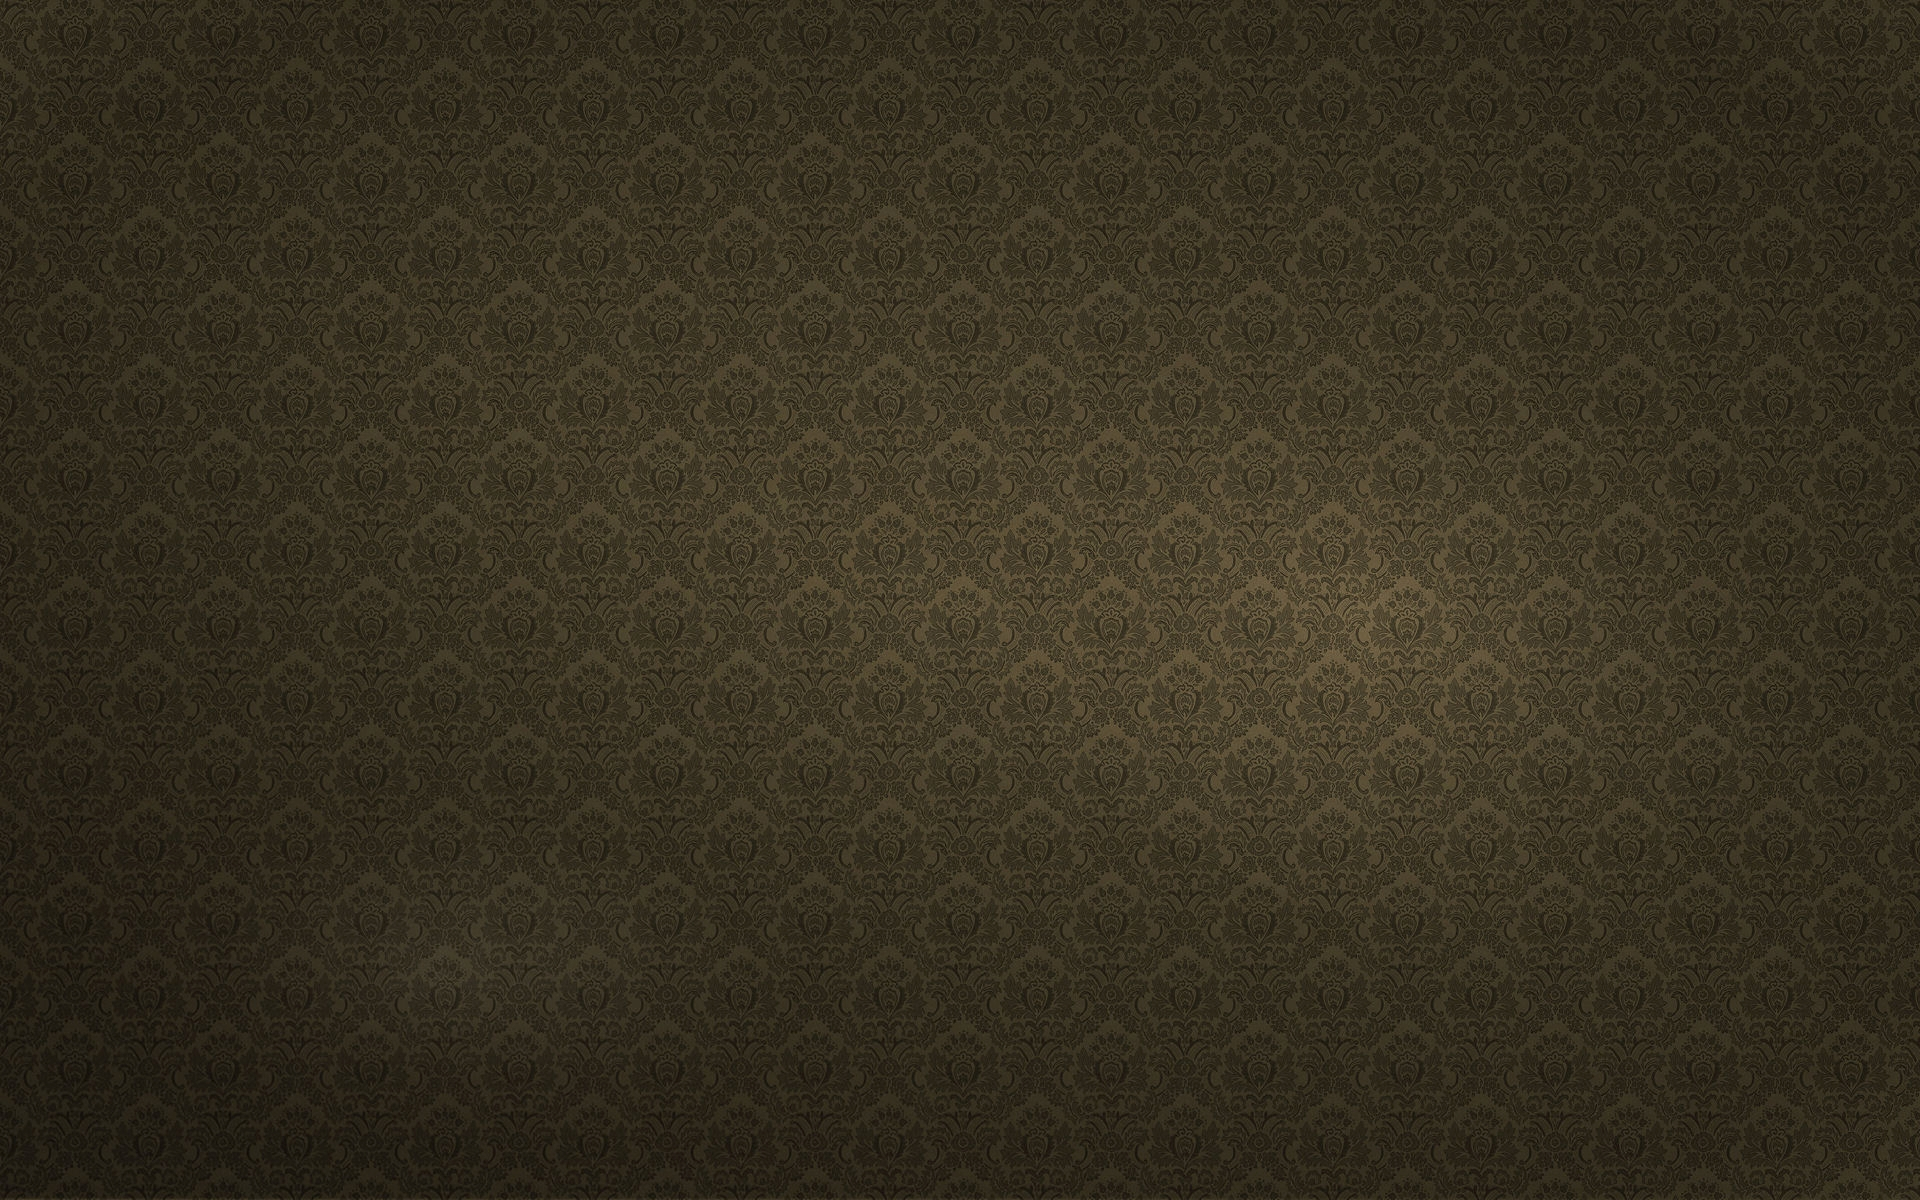 samurai3 brown filter vintage gold walls wallpapers room 1920x1200